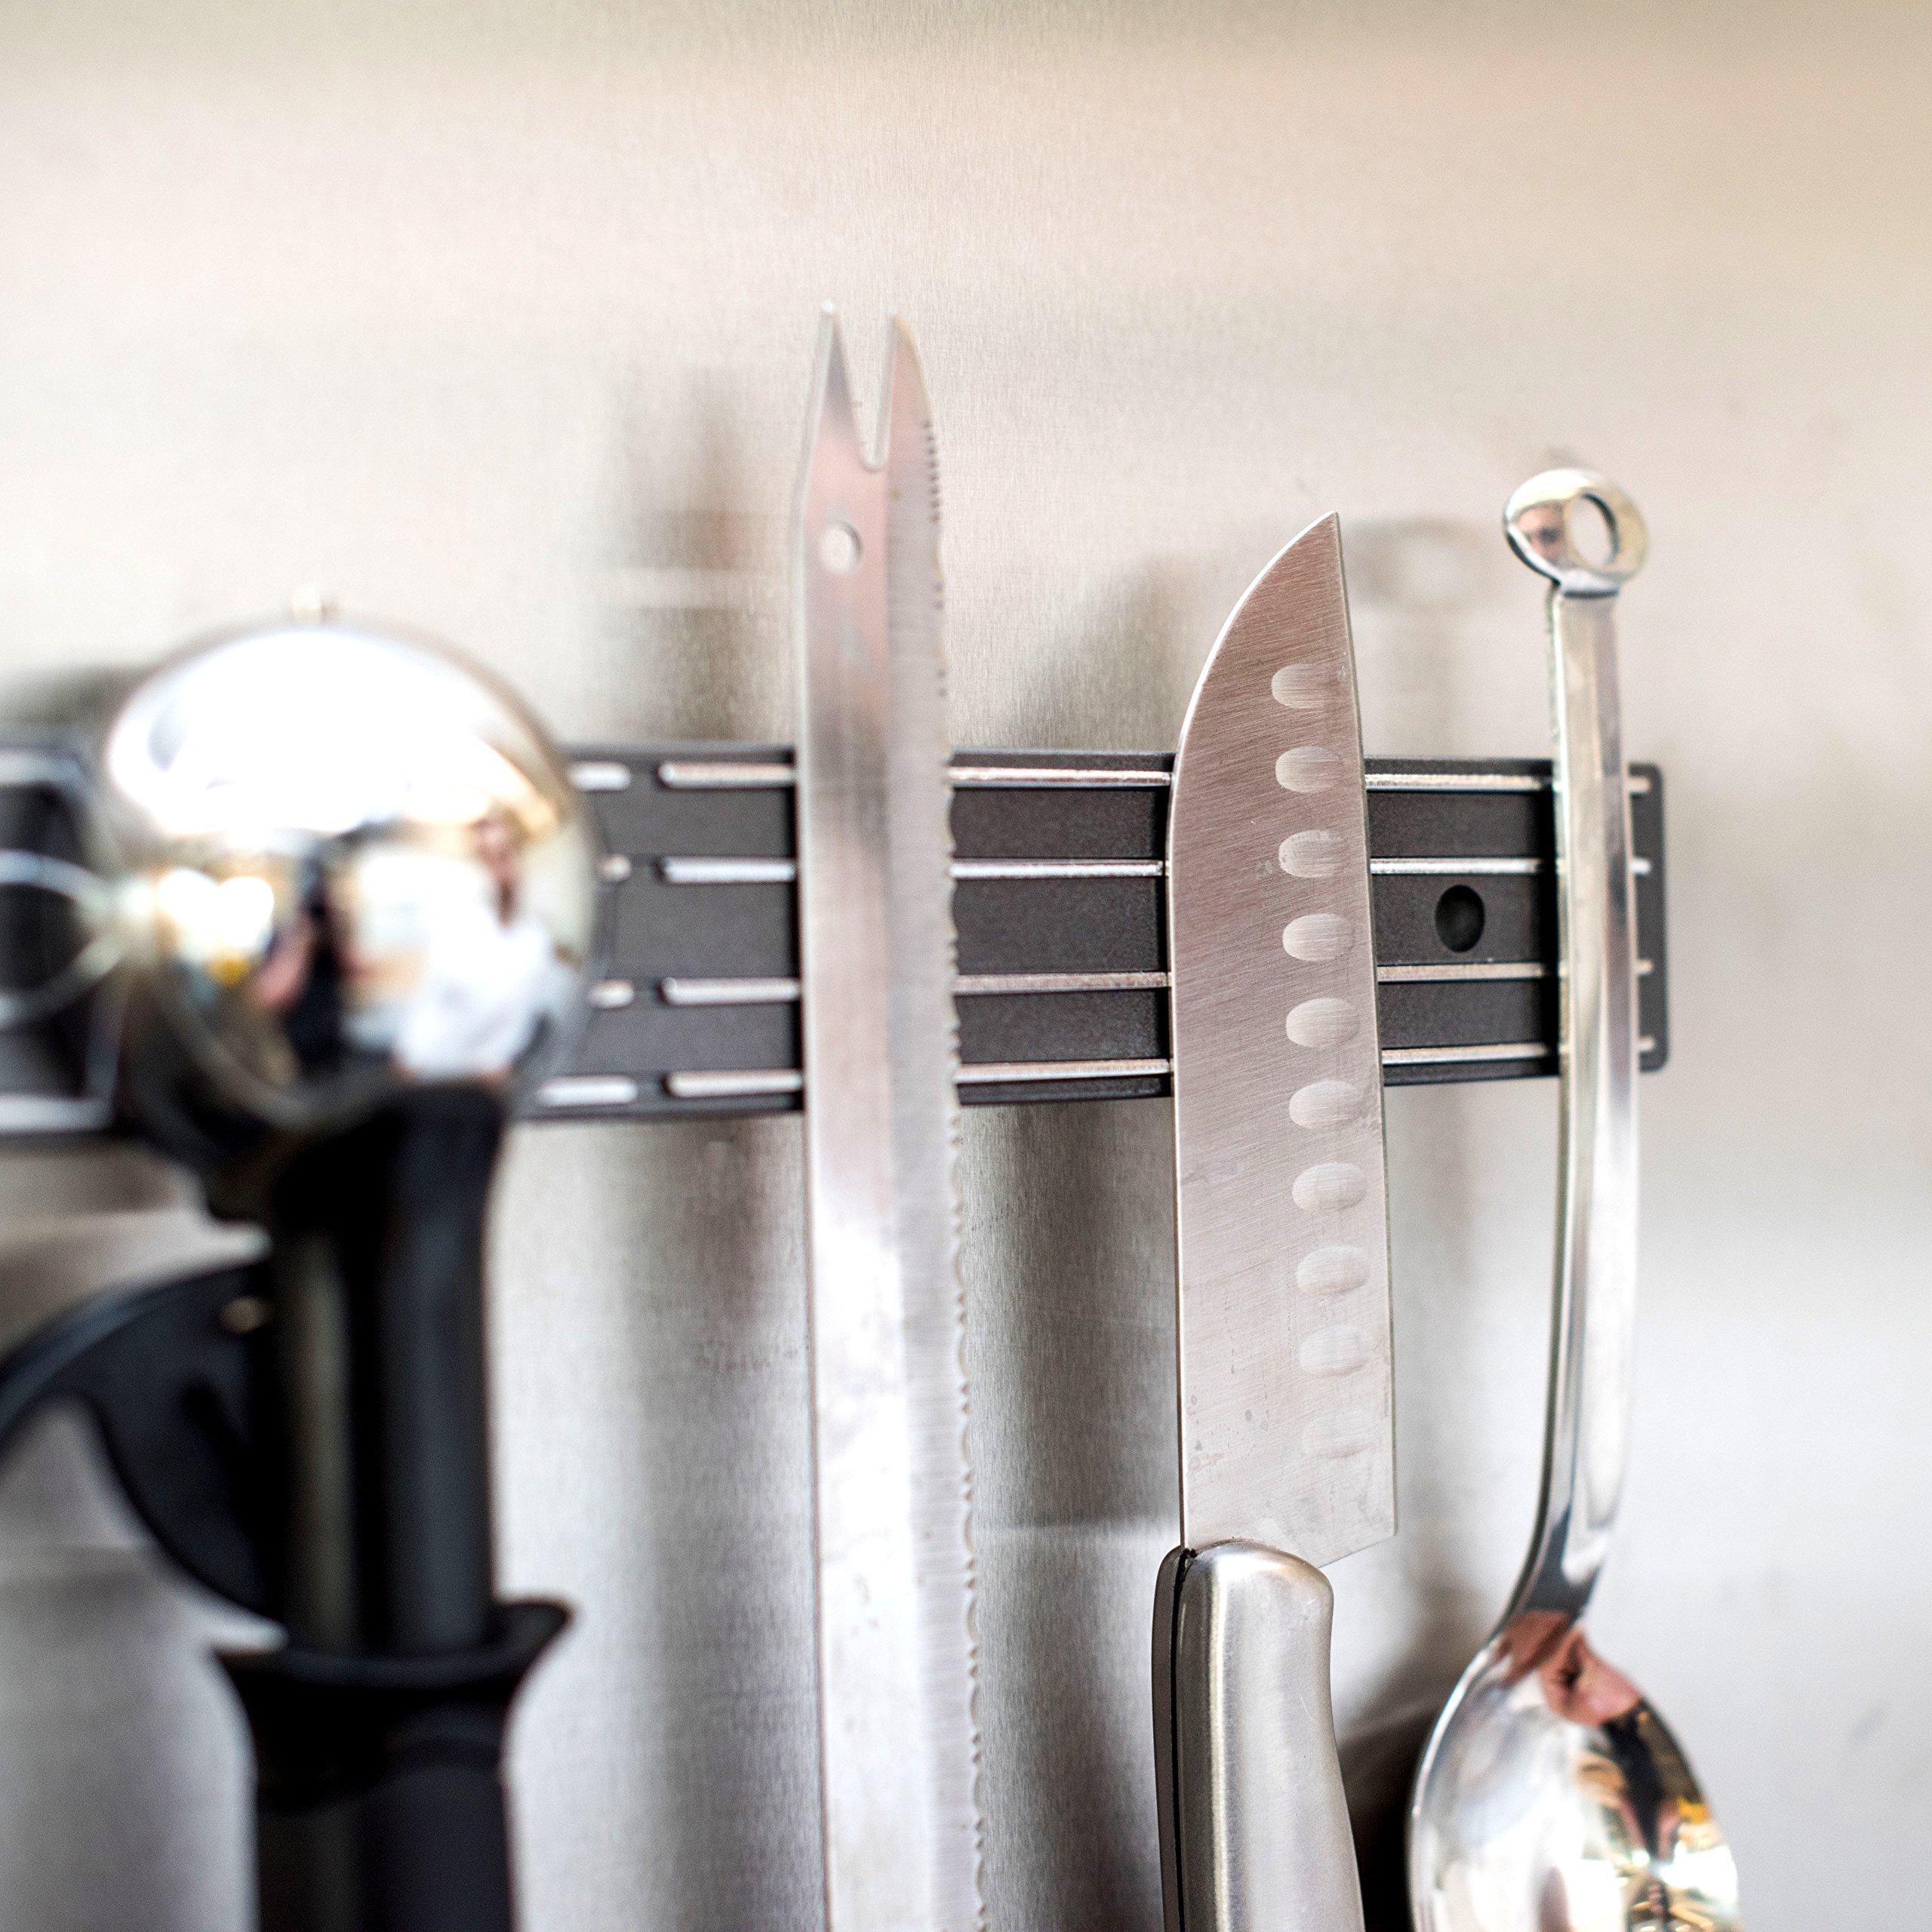 Master Magnetics Magnetic Tool Holder/Magnetic Knife Holder, 12-inch Double-Sided Magnet Strip, Mount on Metal Surface (Black) 07577 by Master Magnetics (Image #5)